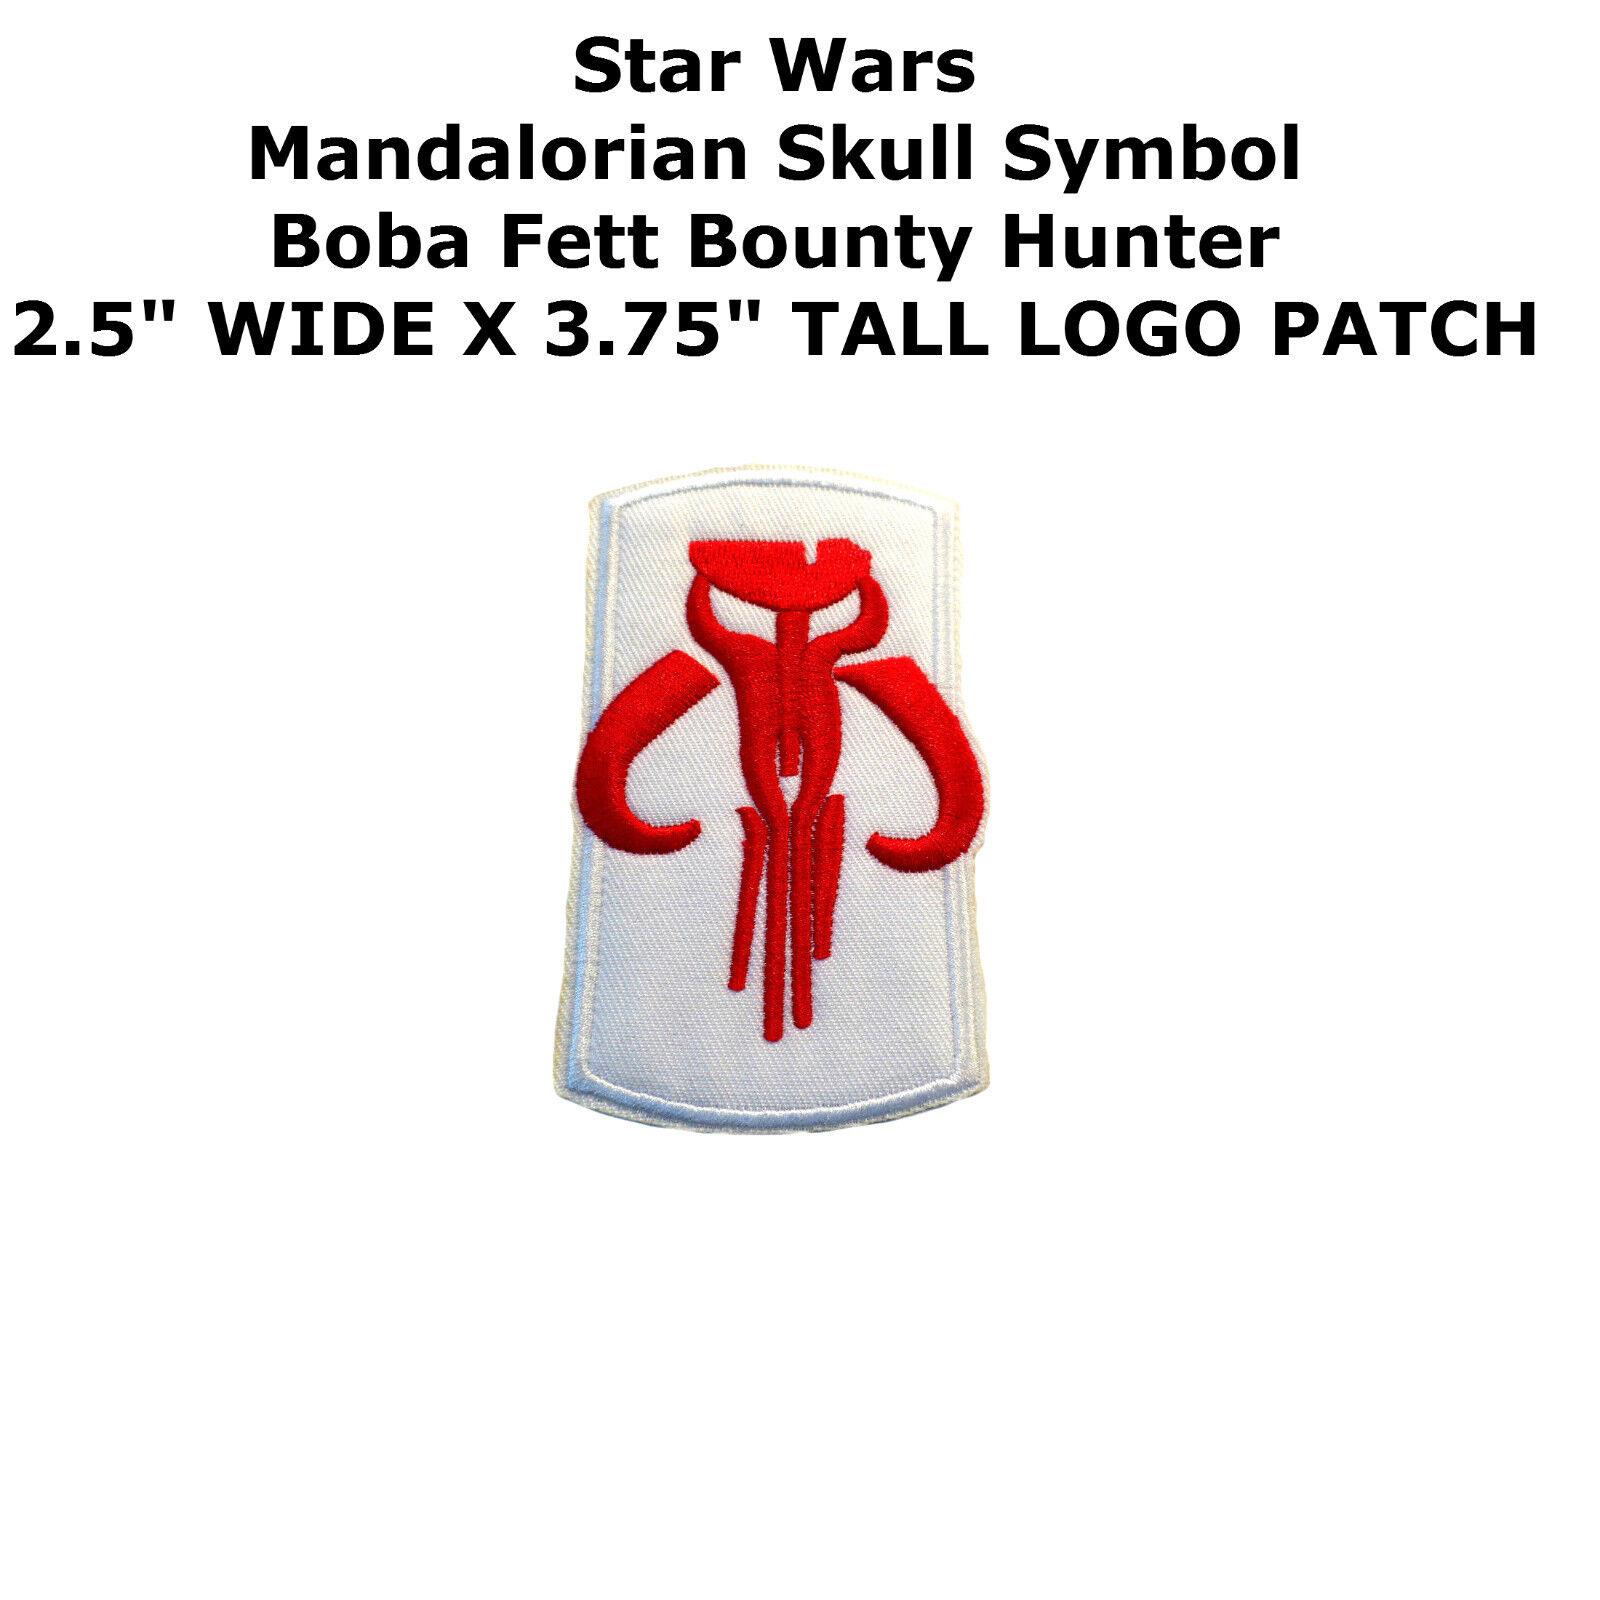 Mandalorian skull symbol boba fett bounty hunter star wars ironon picture 1 of 12 buycottarizona Image collections